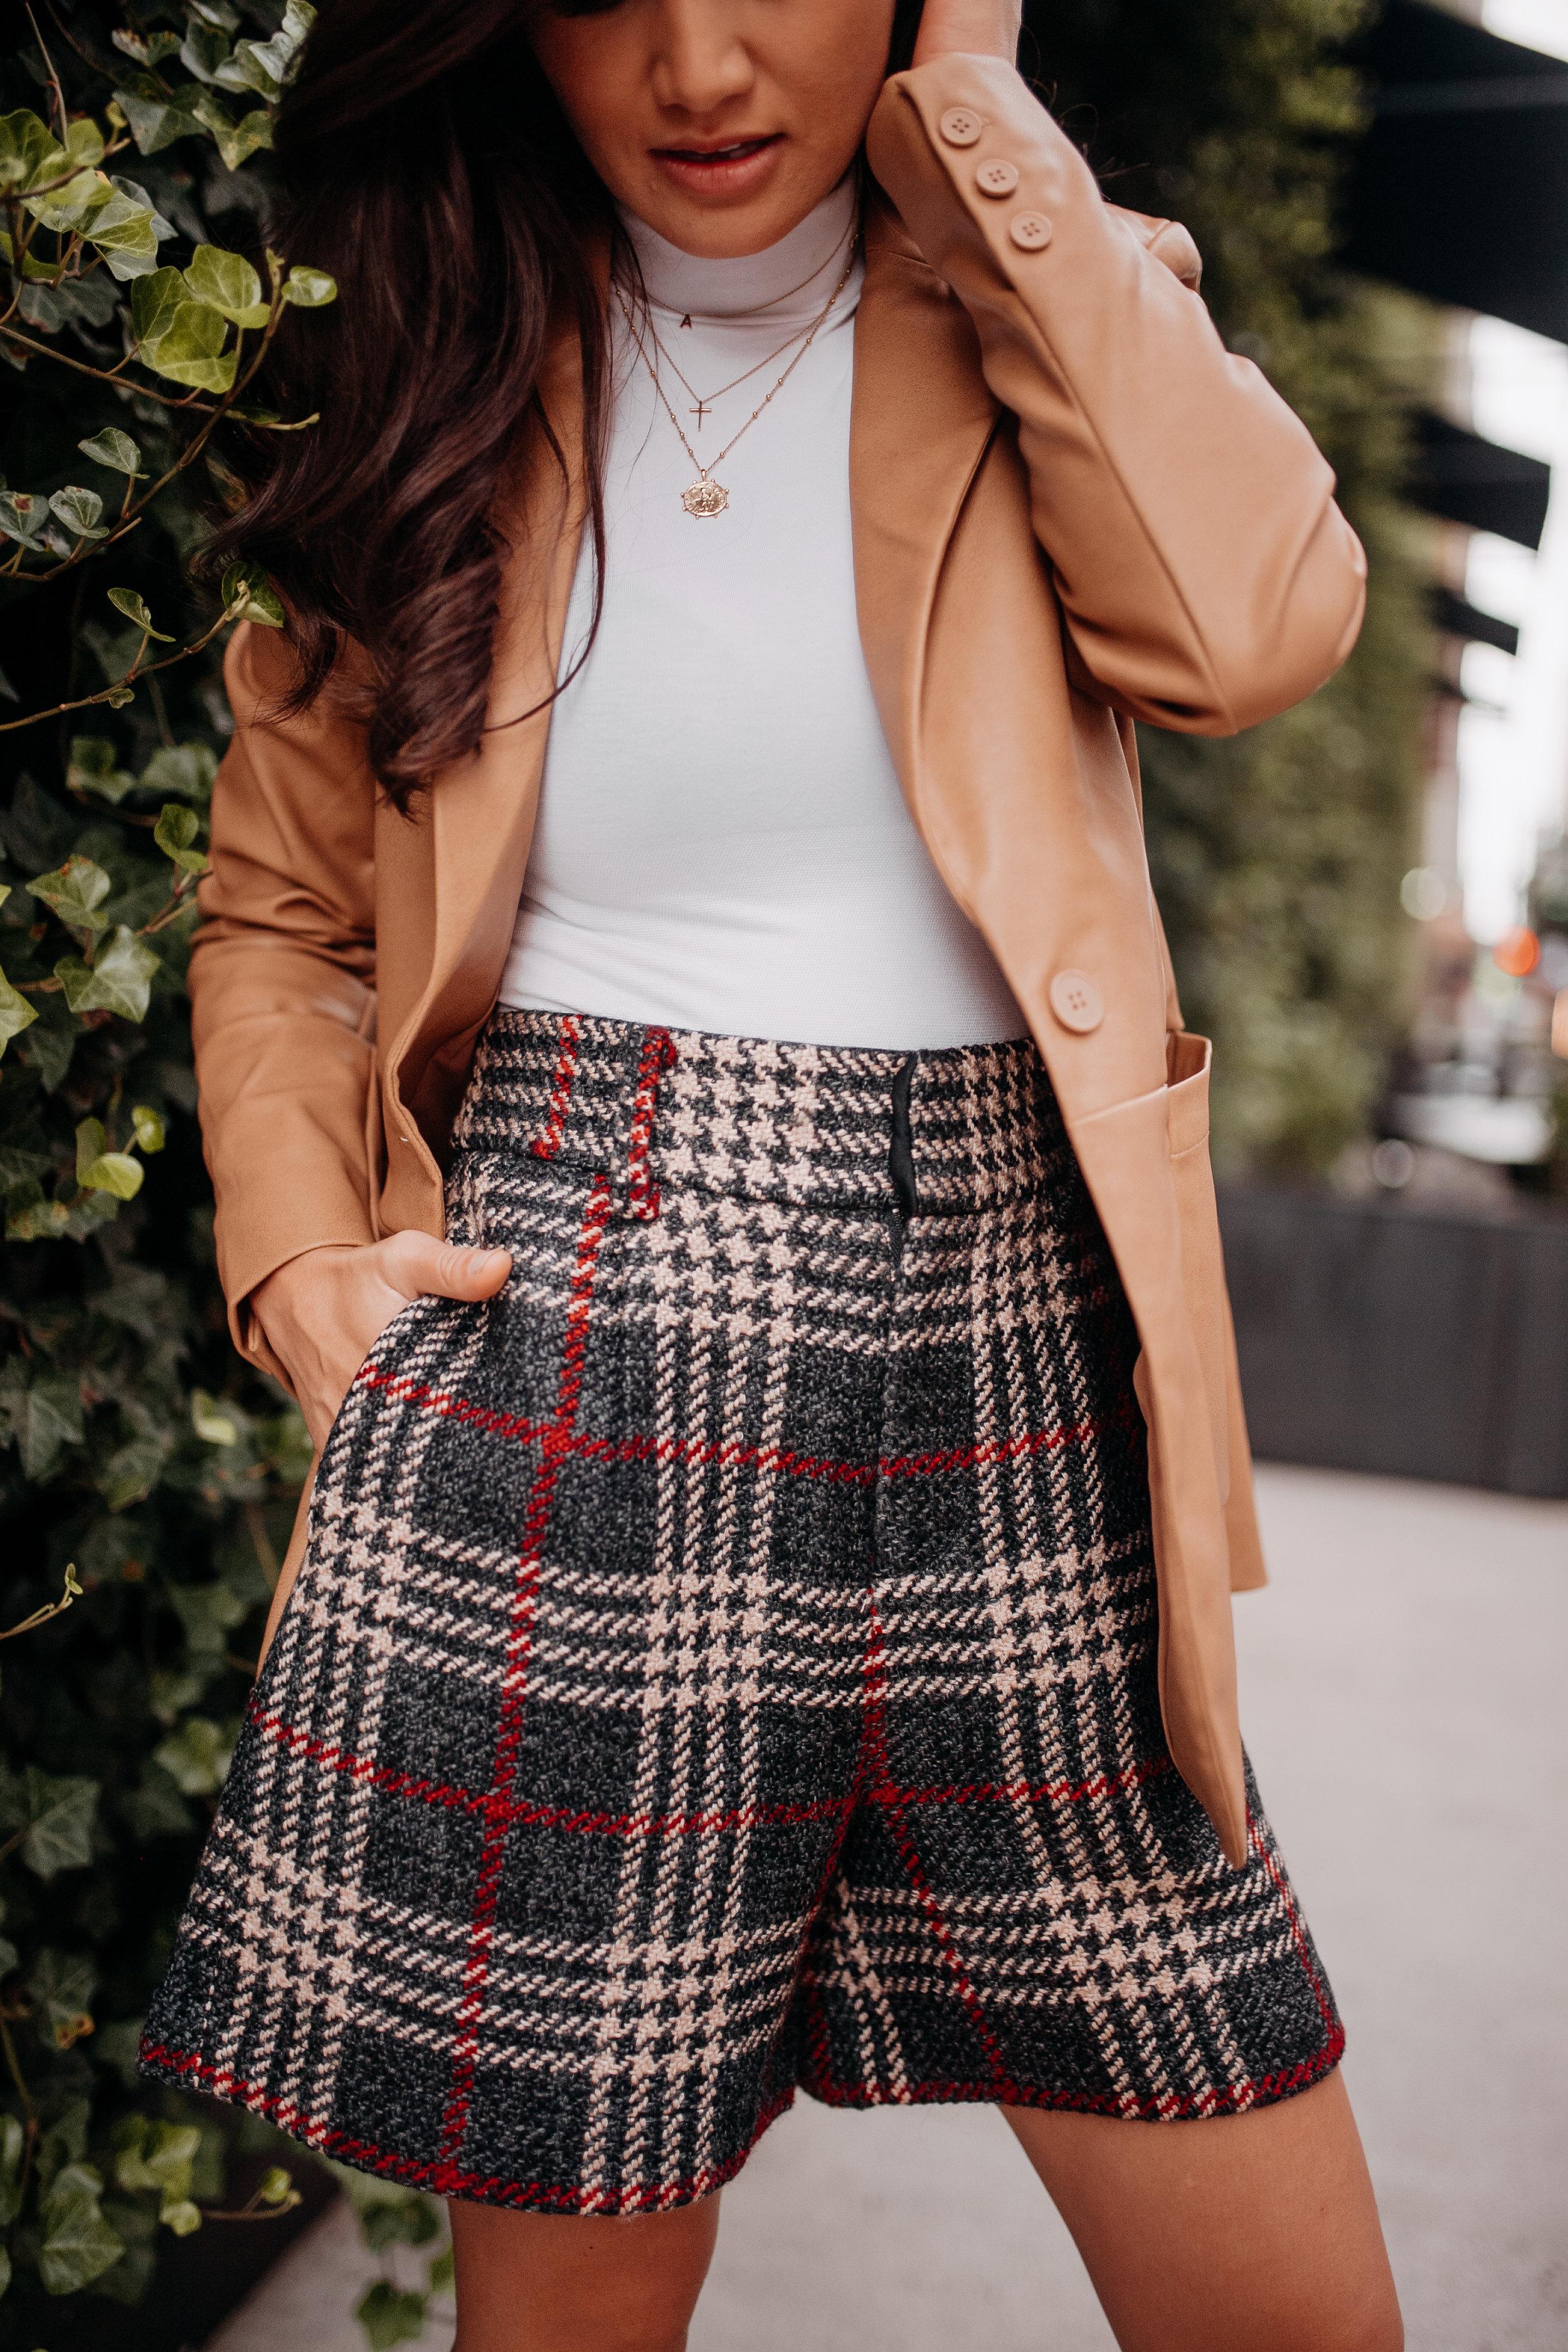 Caila quinn the bachelor express NYFW New York Fashion Week Clothing Launch Fall